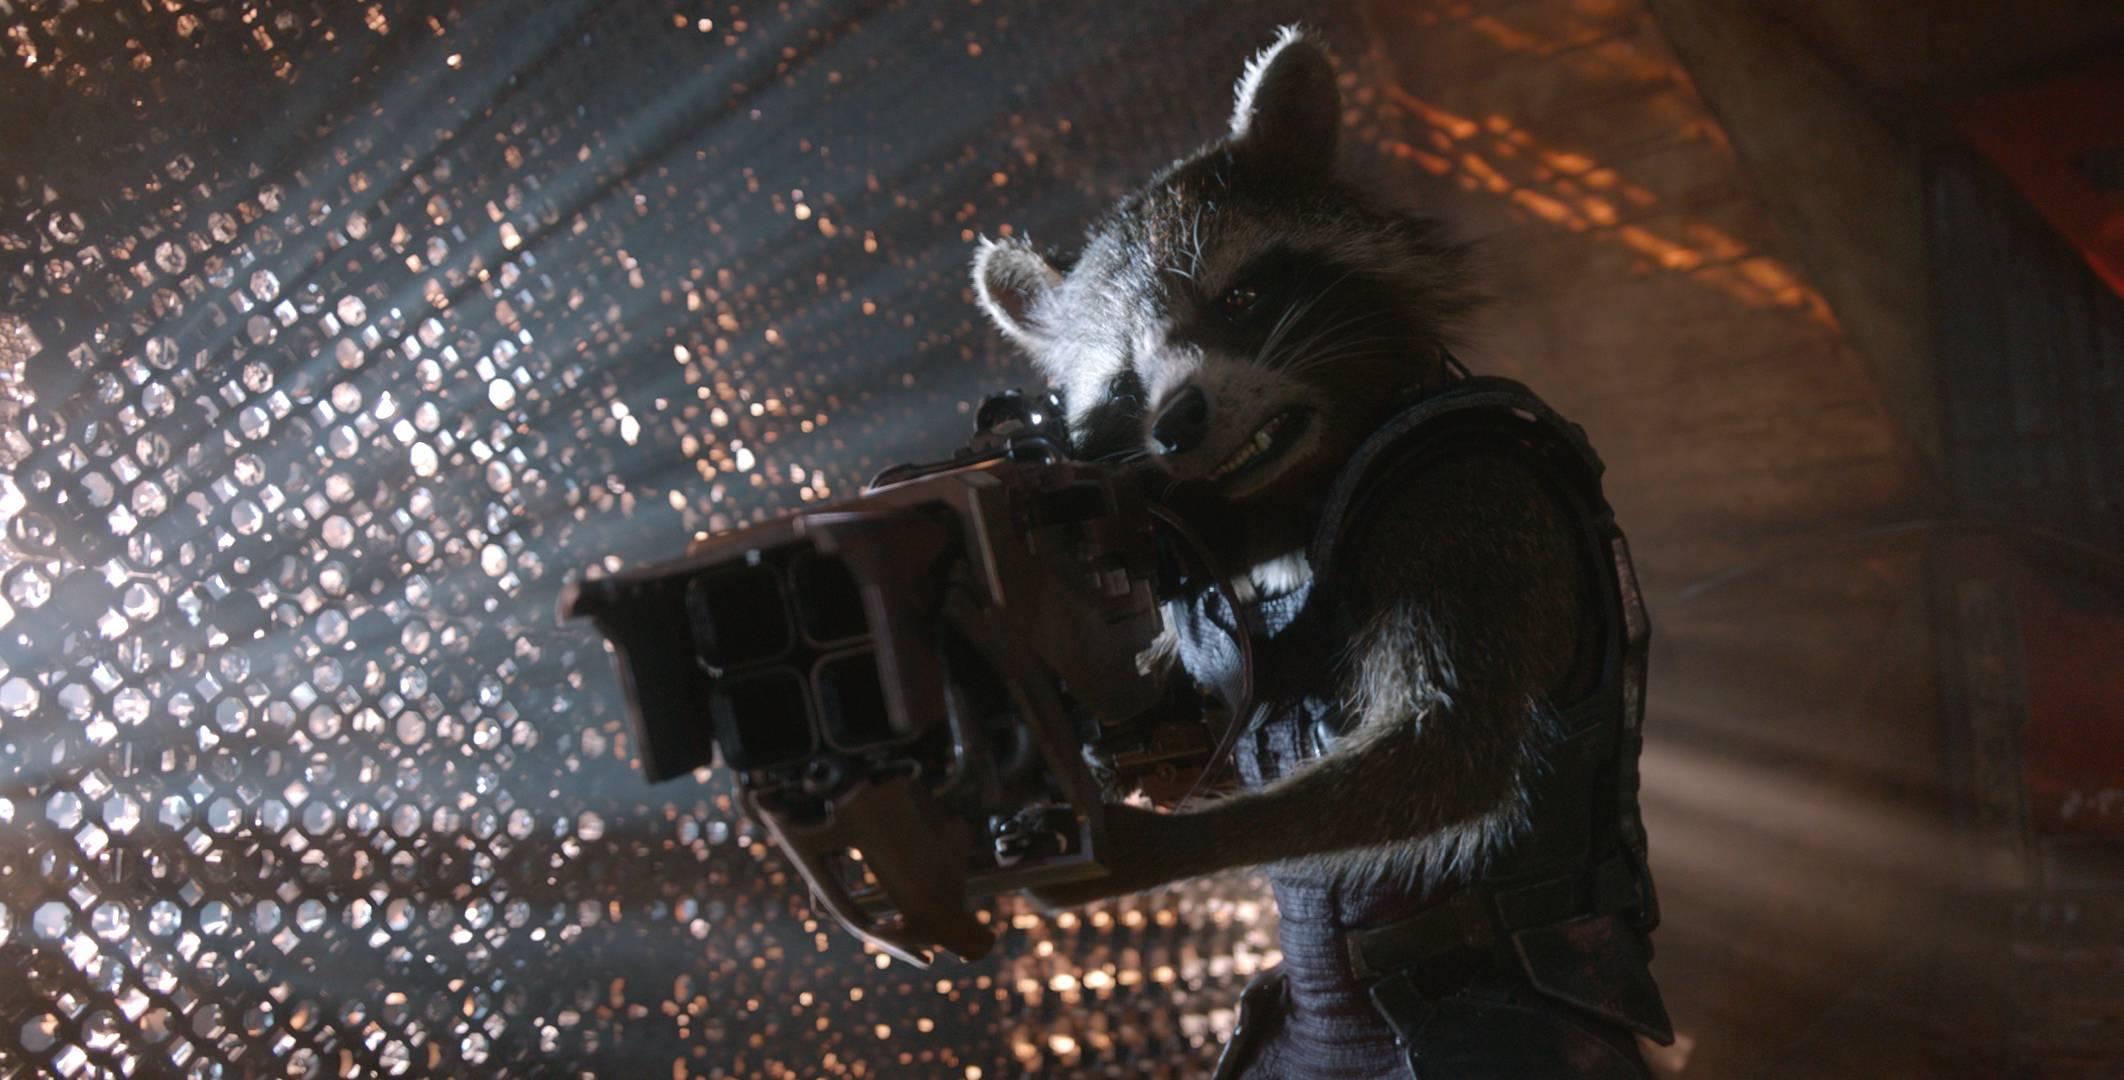 rocket-raccoon-guardians-of-the-galaxy-bradley-cooper